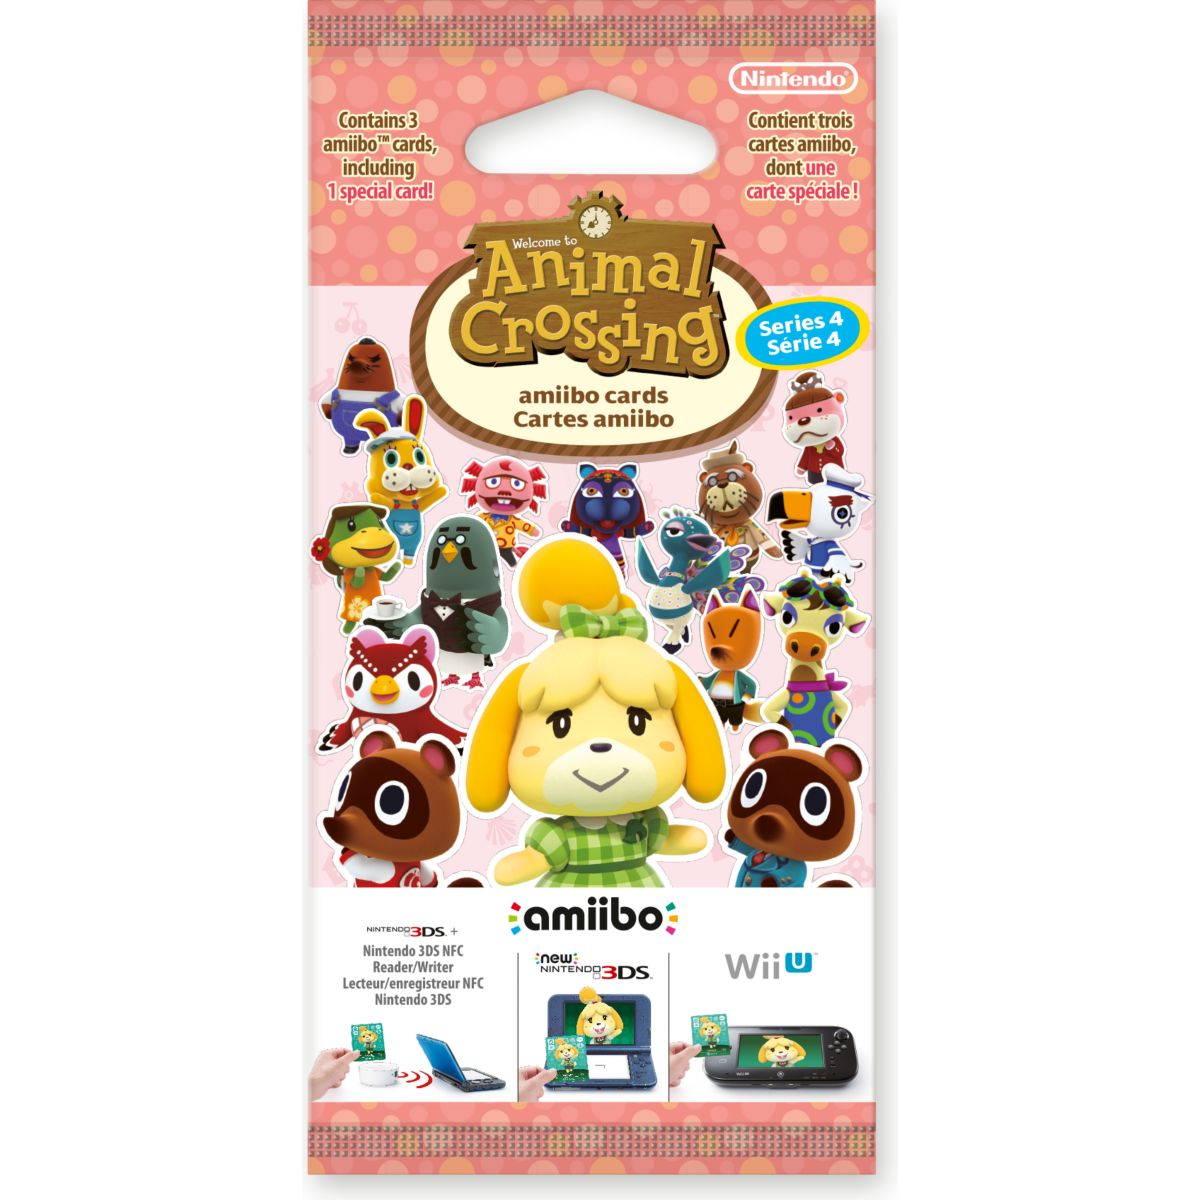 Pack cartes Amiibo NINTENDO 3 cartes Animal Crossing HDD Série 4 (photo)